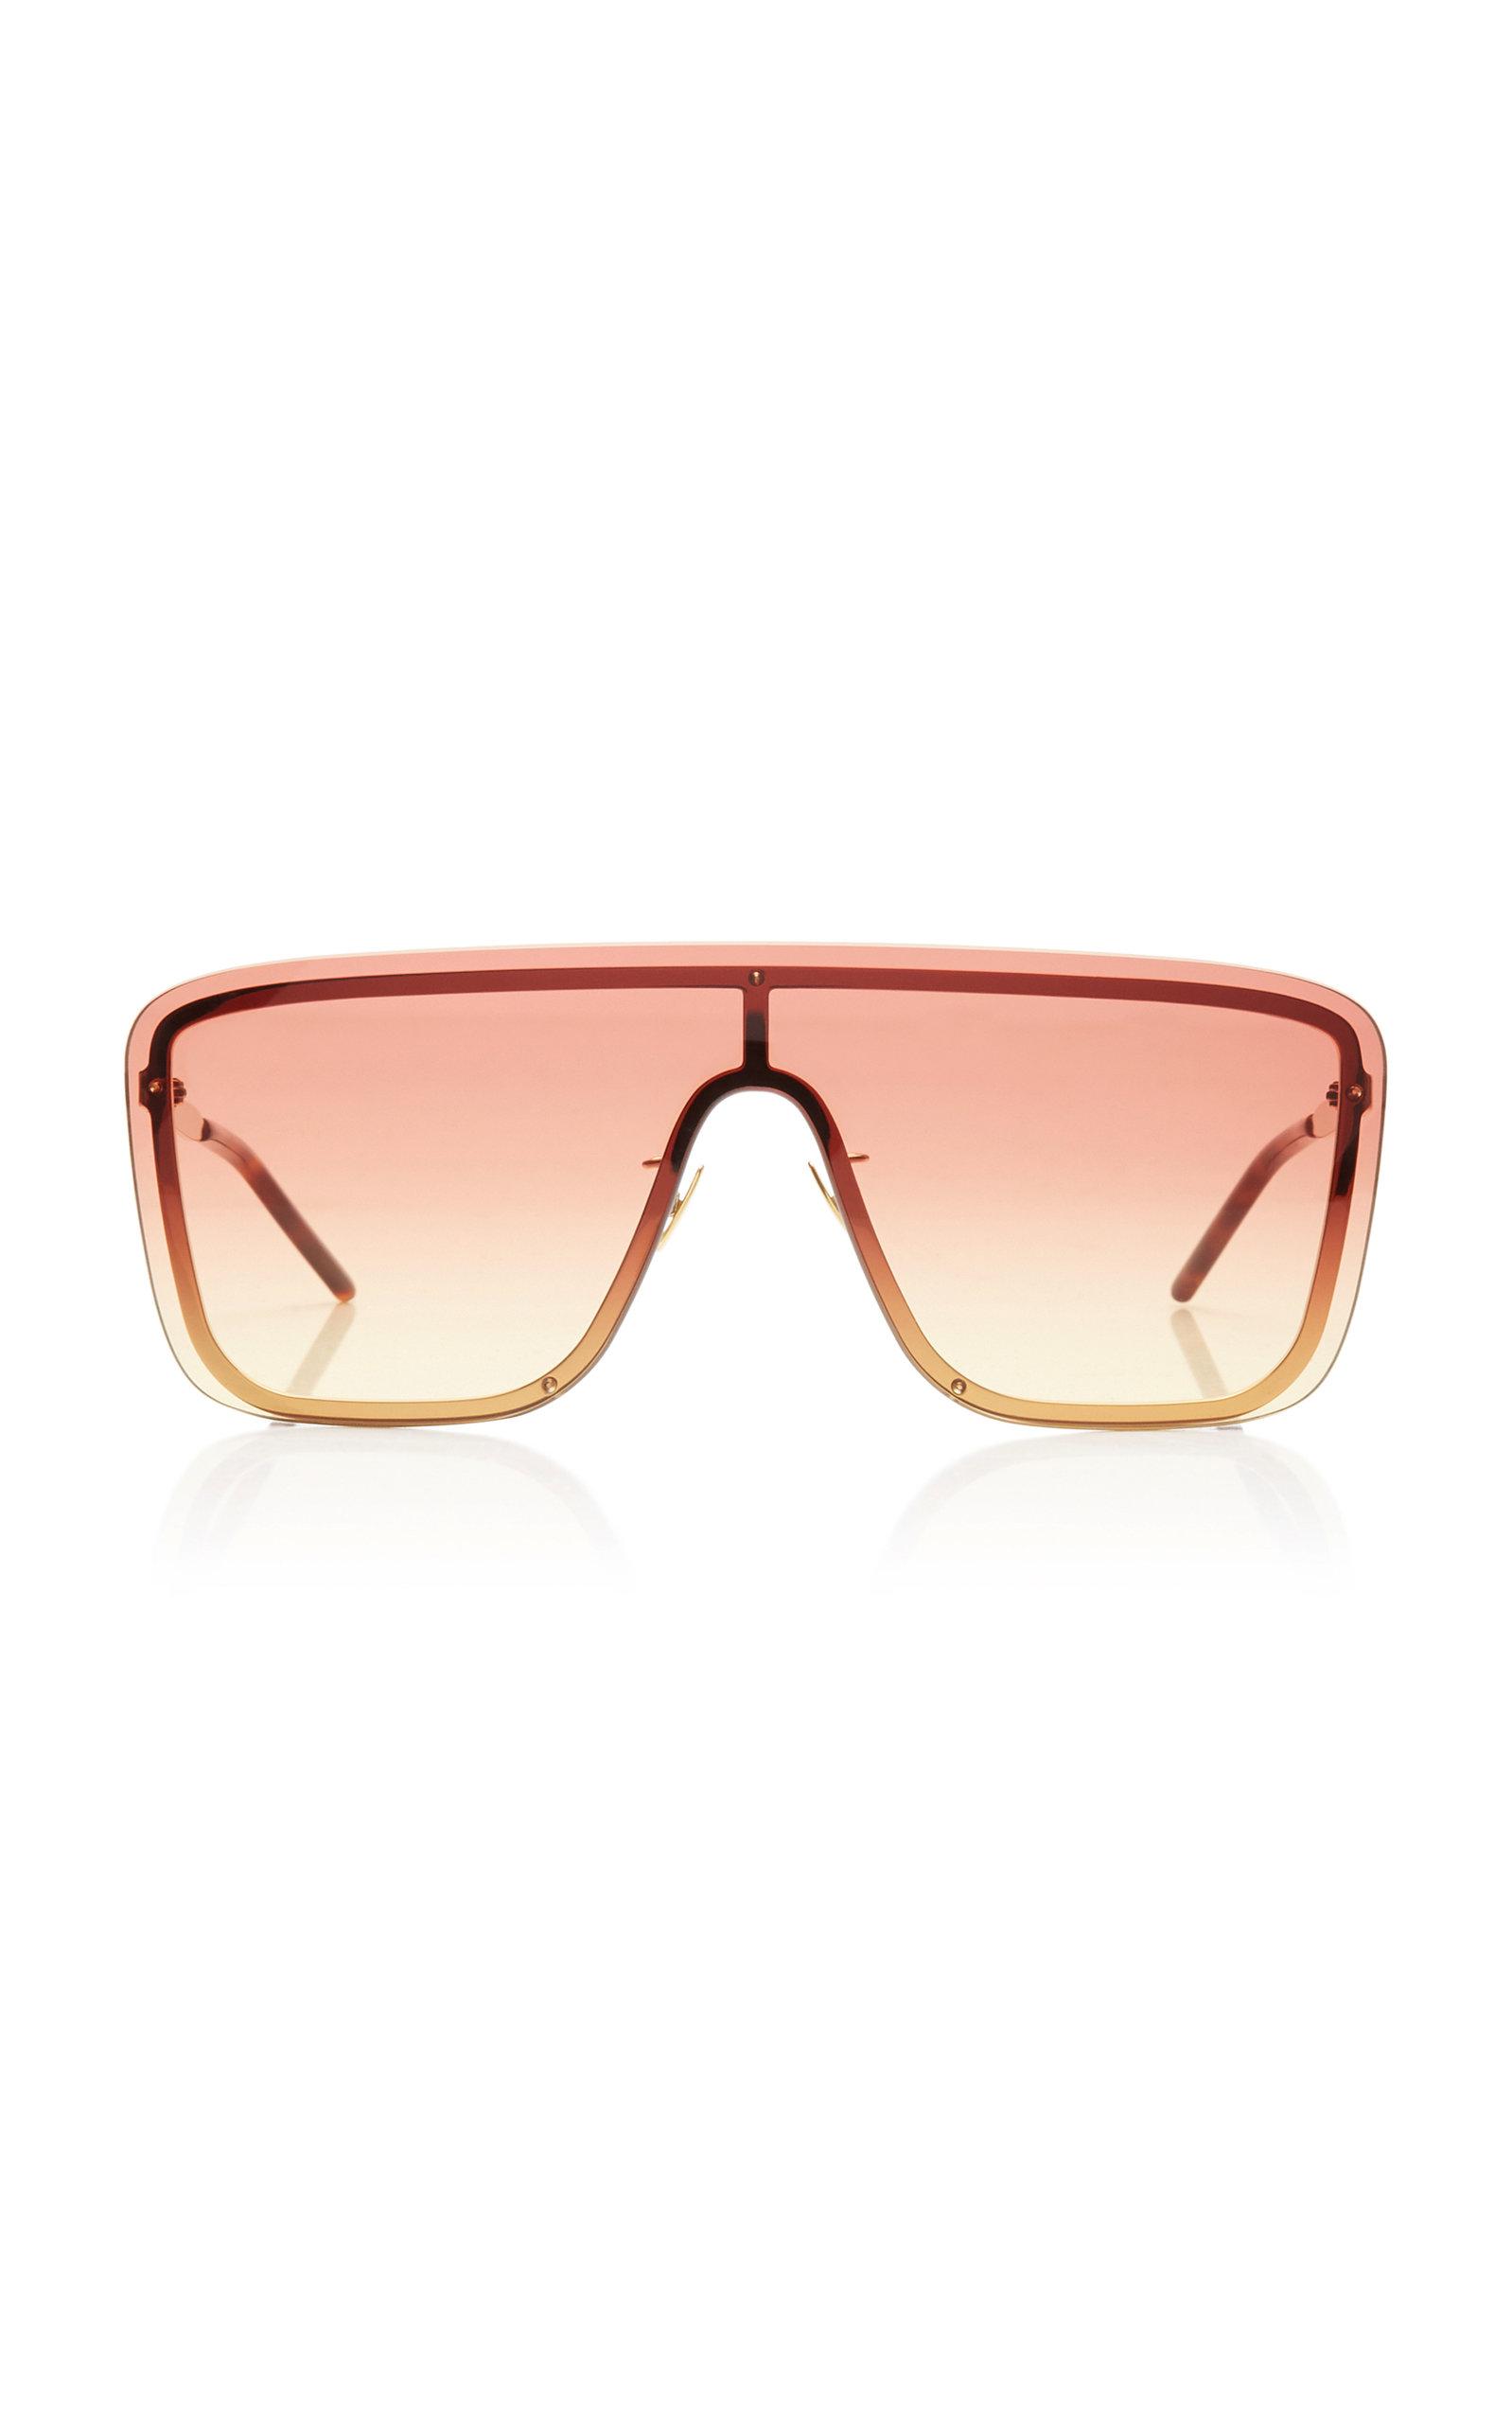 Saint Laurent - Women's Mask D-Frame Metal Sunglasses - Pink/green - Moda Operandi